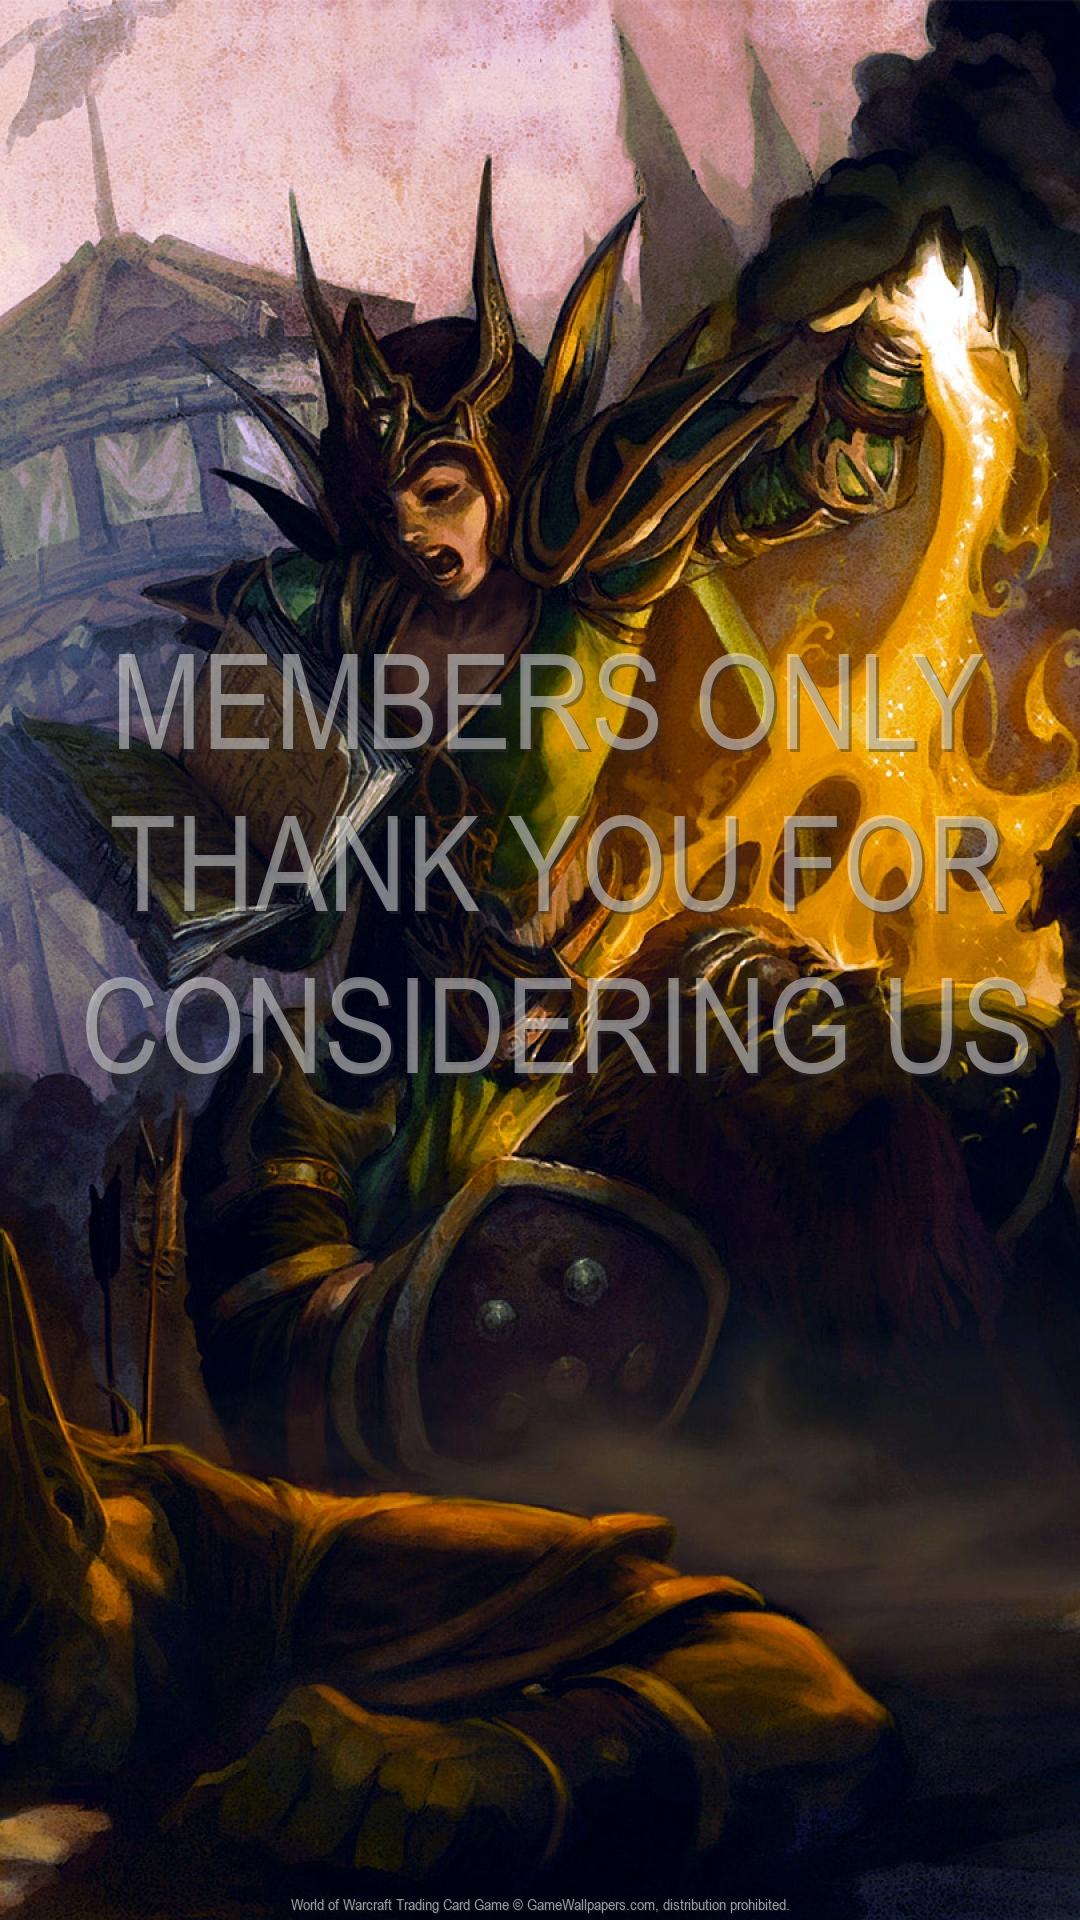 World of Warcraft: Trading Card Game 1920x1080 Handy Hintergrundbild 41